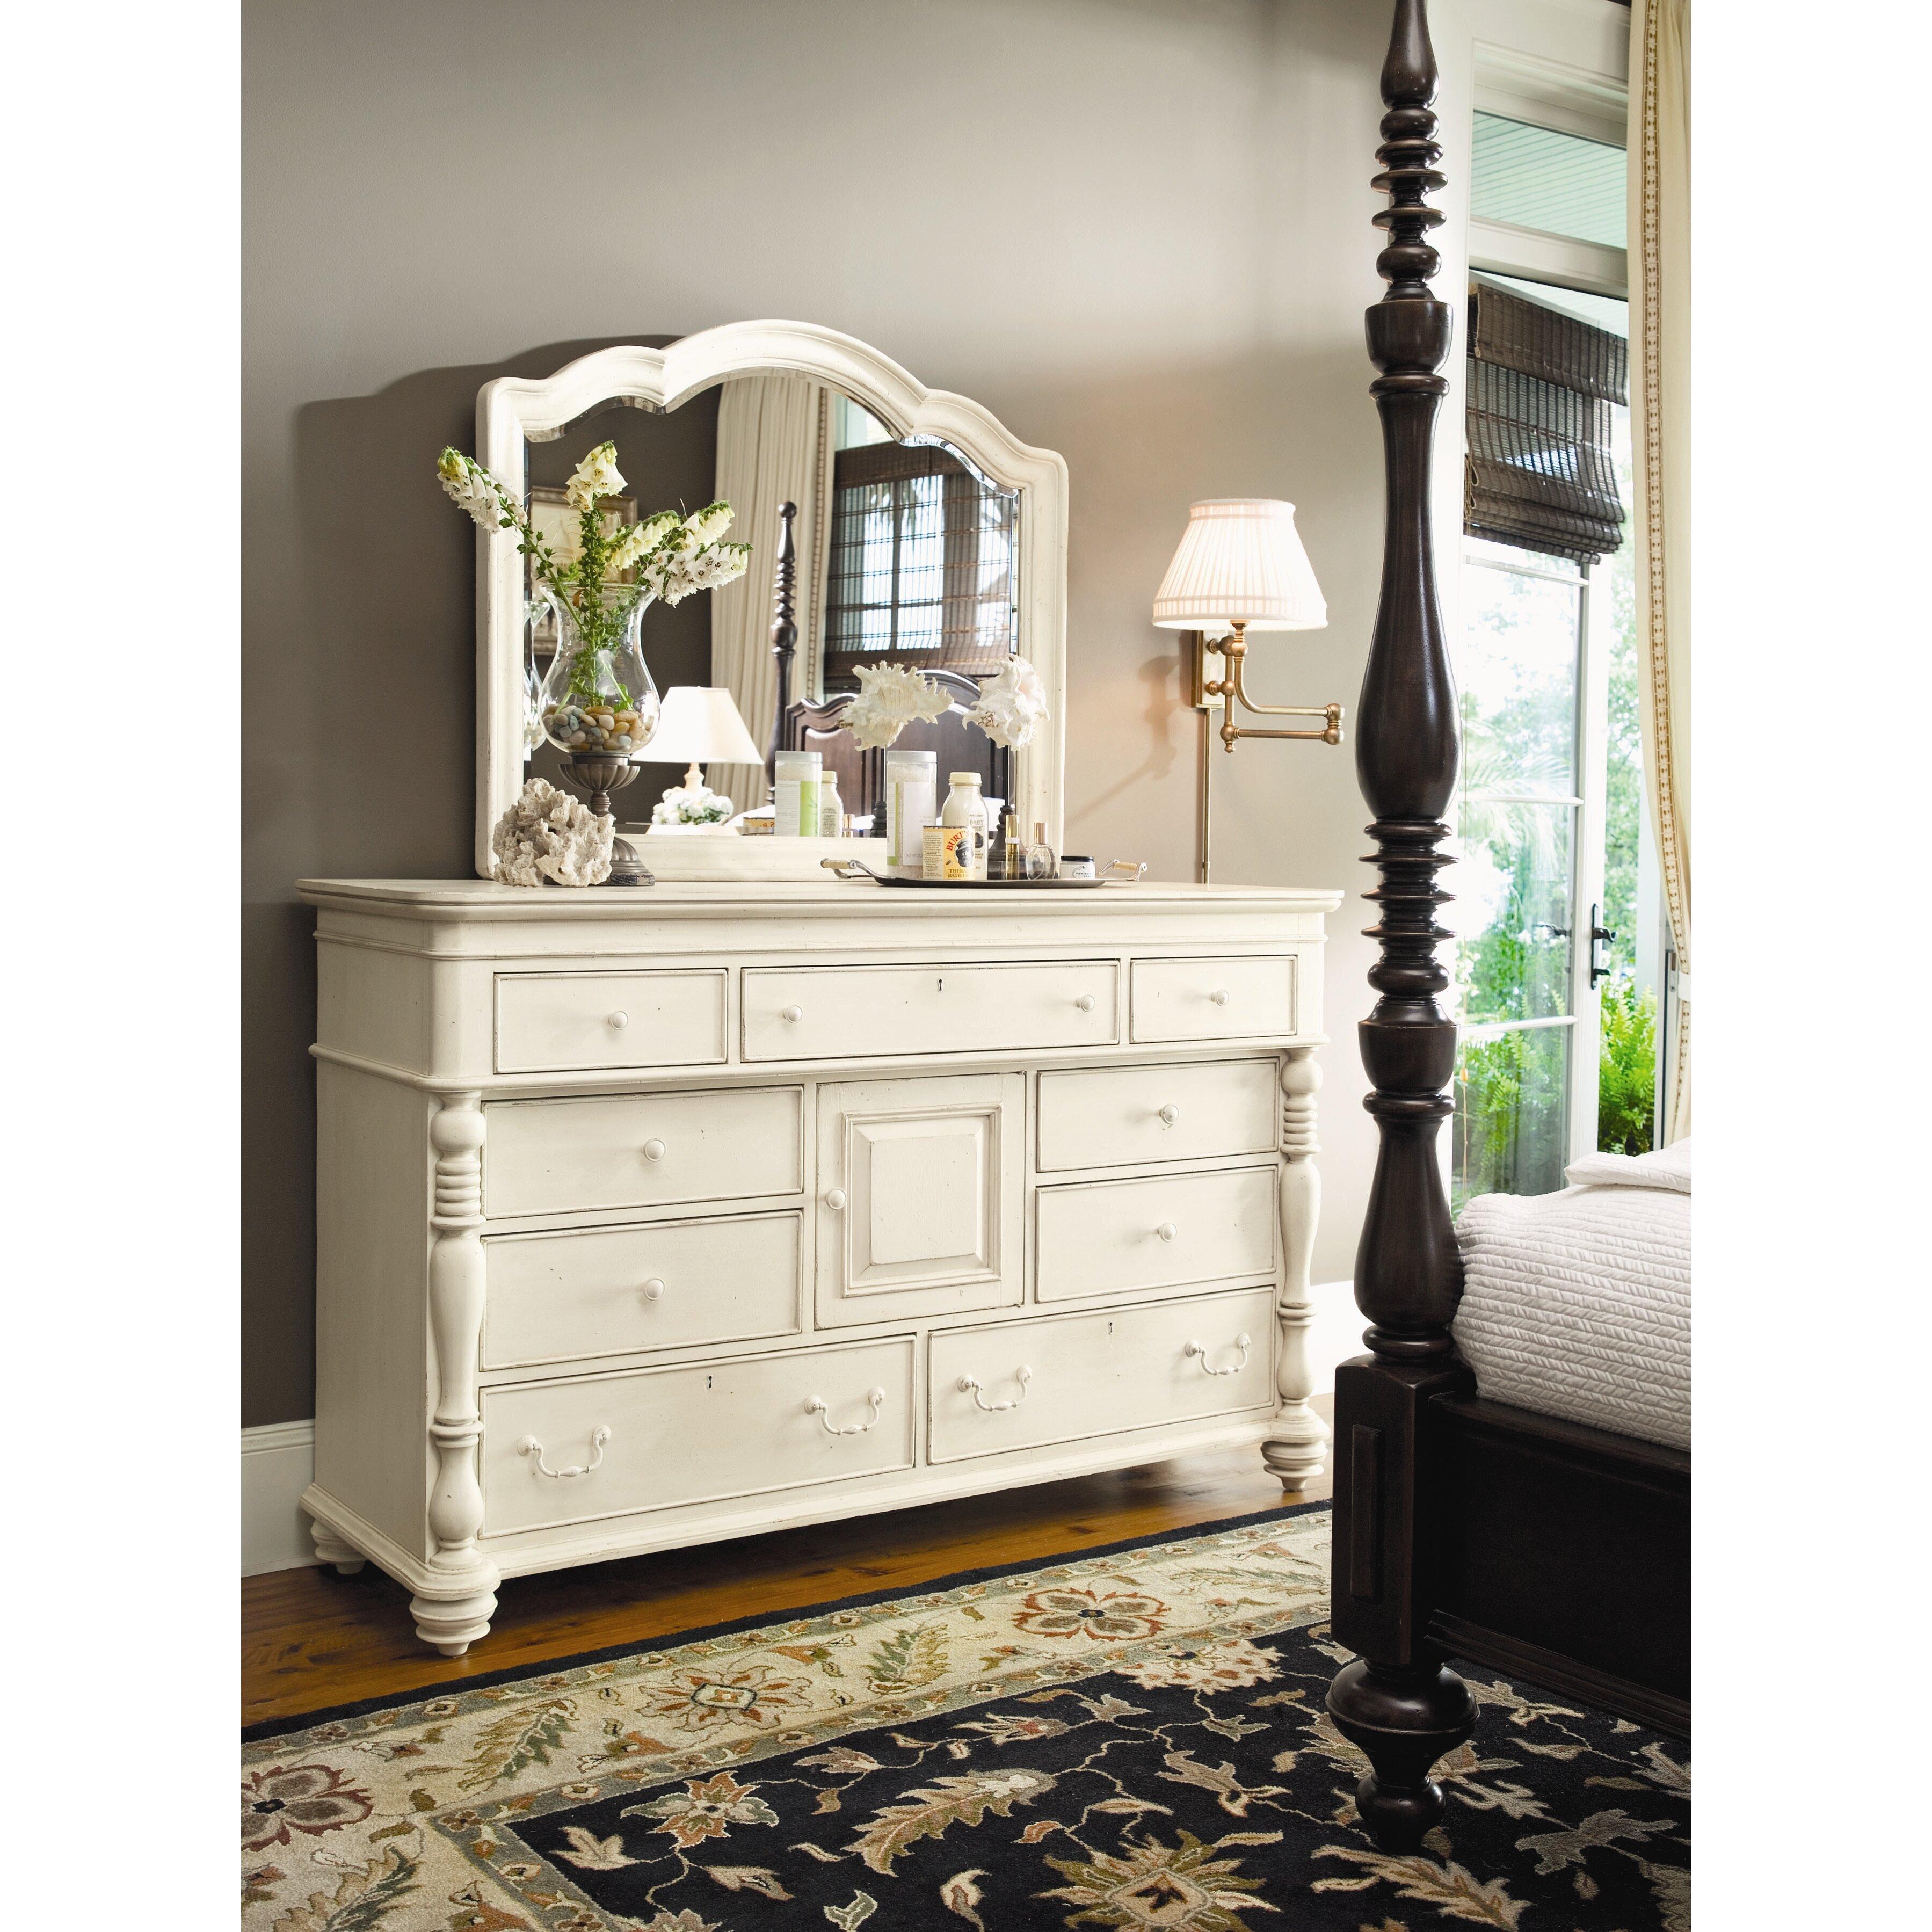 Paula Deen Bedroom Furniture Collection Paula Deen Home Steel Magnolia 9 Drawer Combo Dresser Reviews